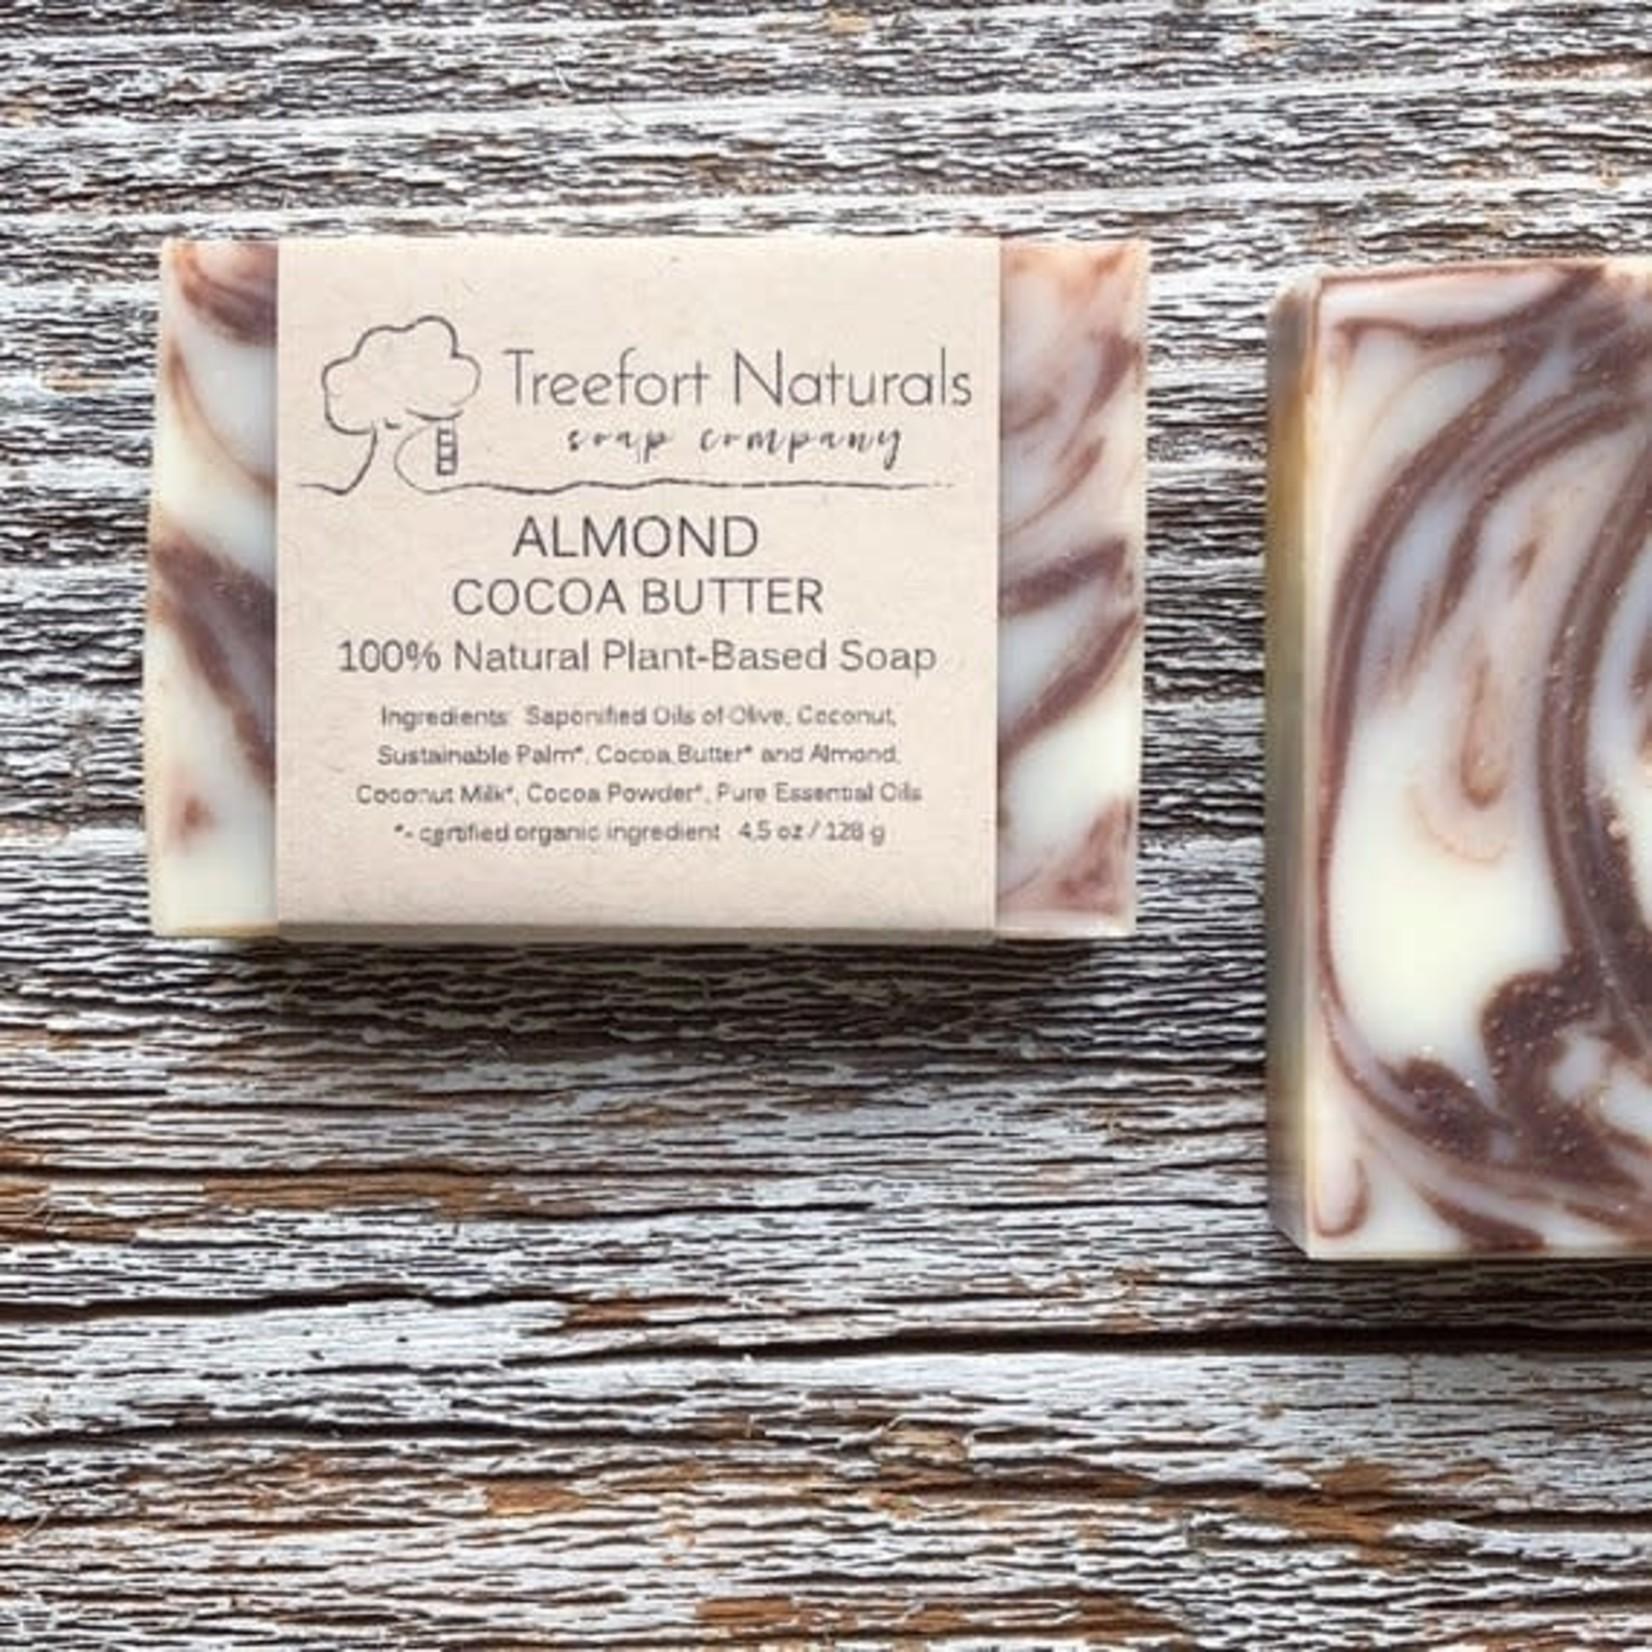 Treefort Naturals Treefort Naturals Almond Cocoa Butter Soap